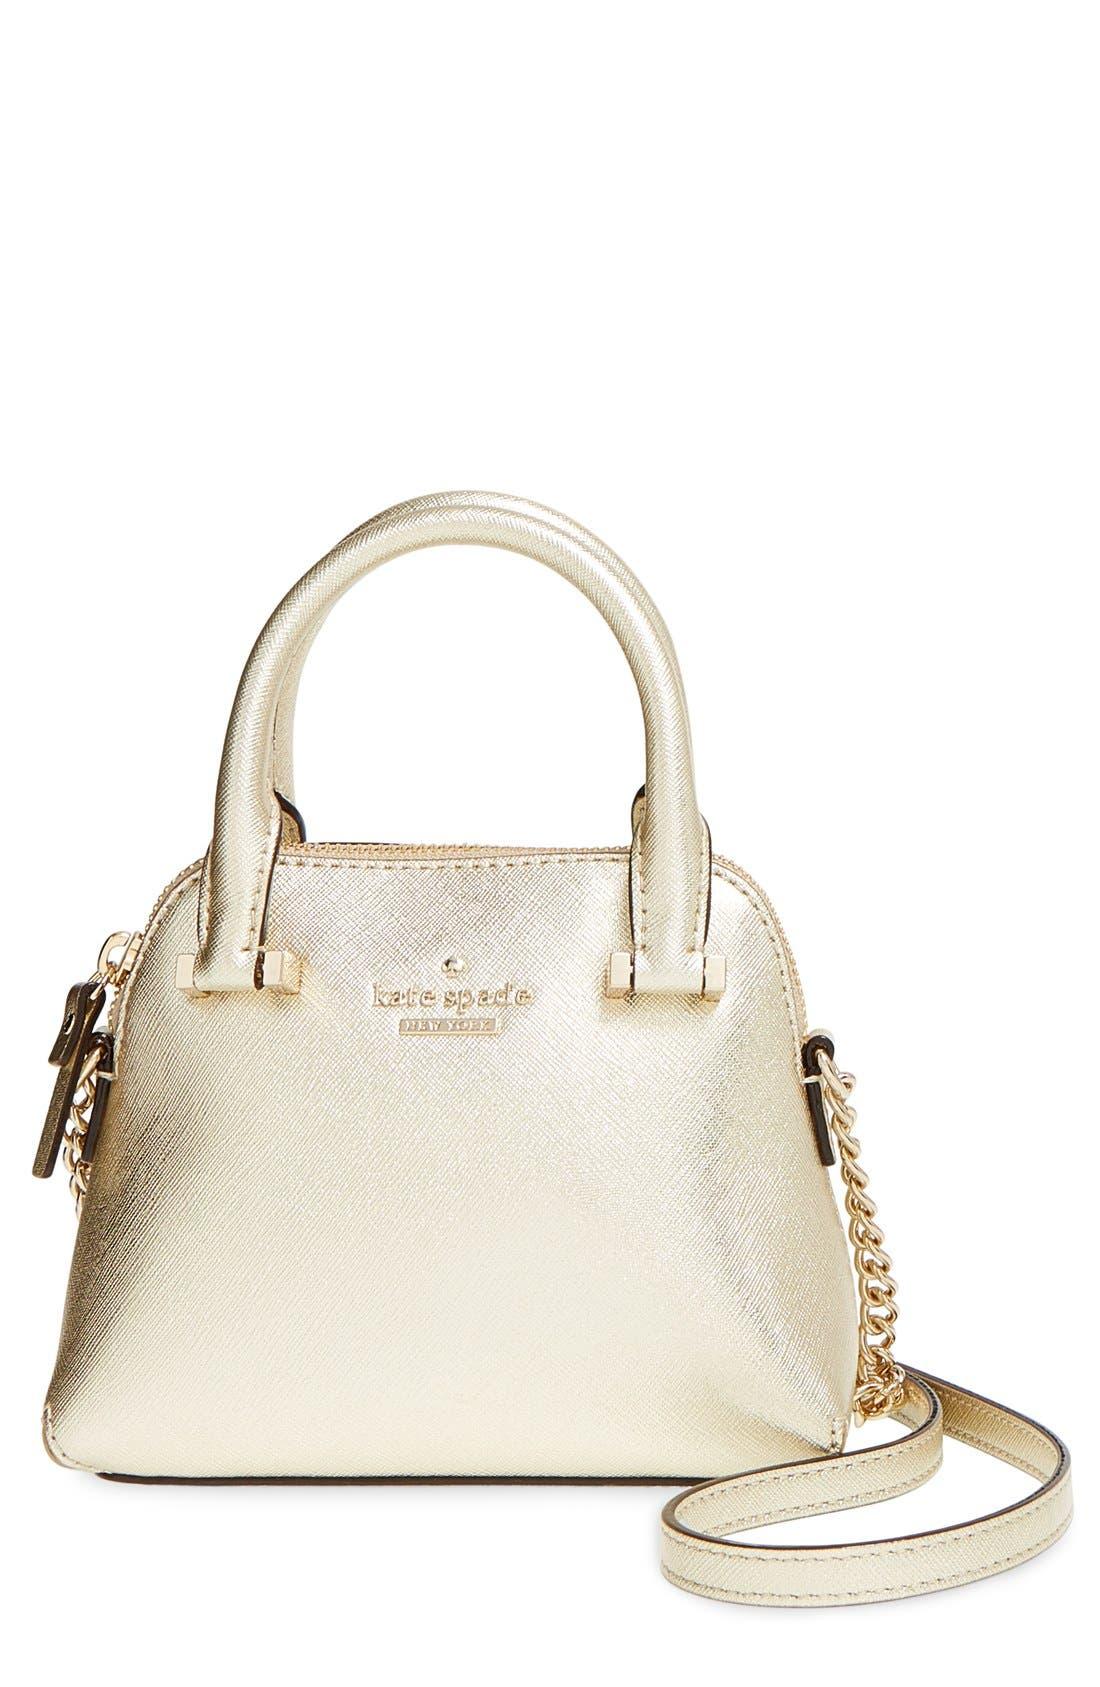 Main Image - kate spade new york 'cedar street - mini maise' metallic leather crossbody bag